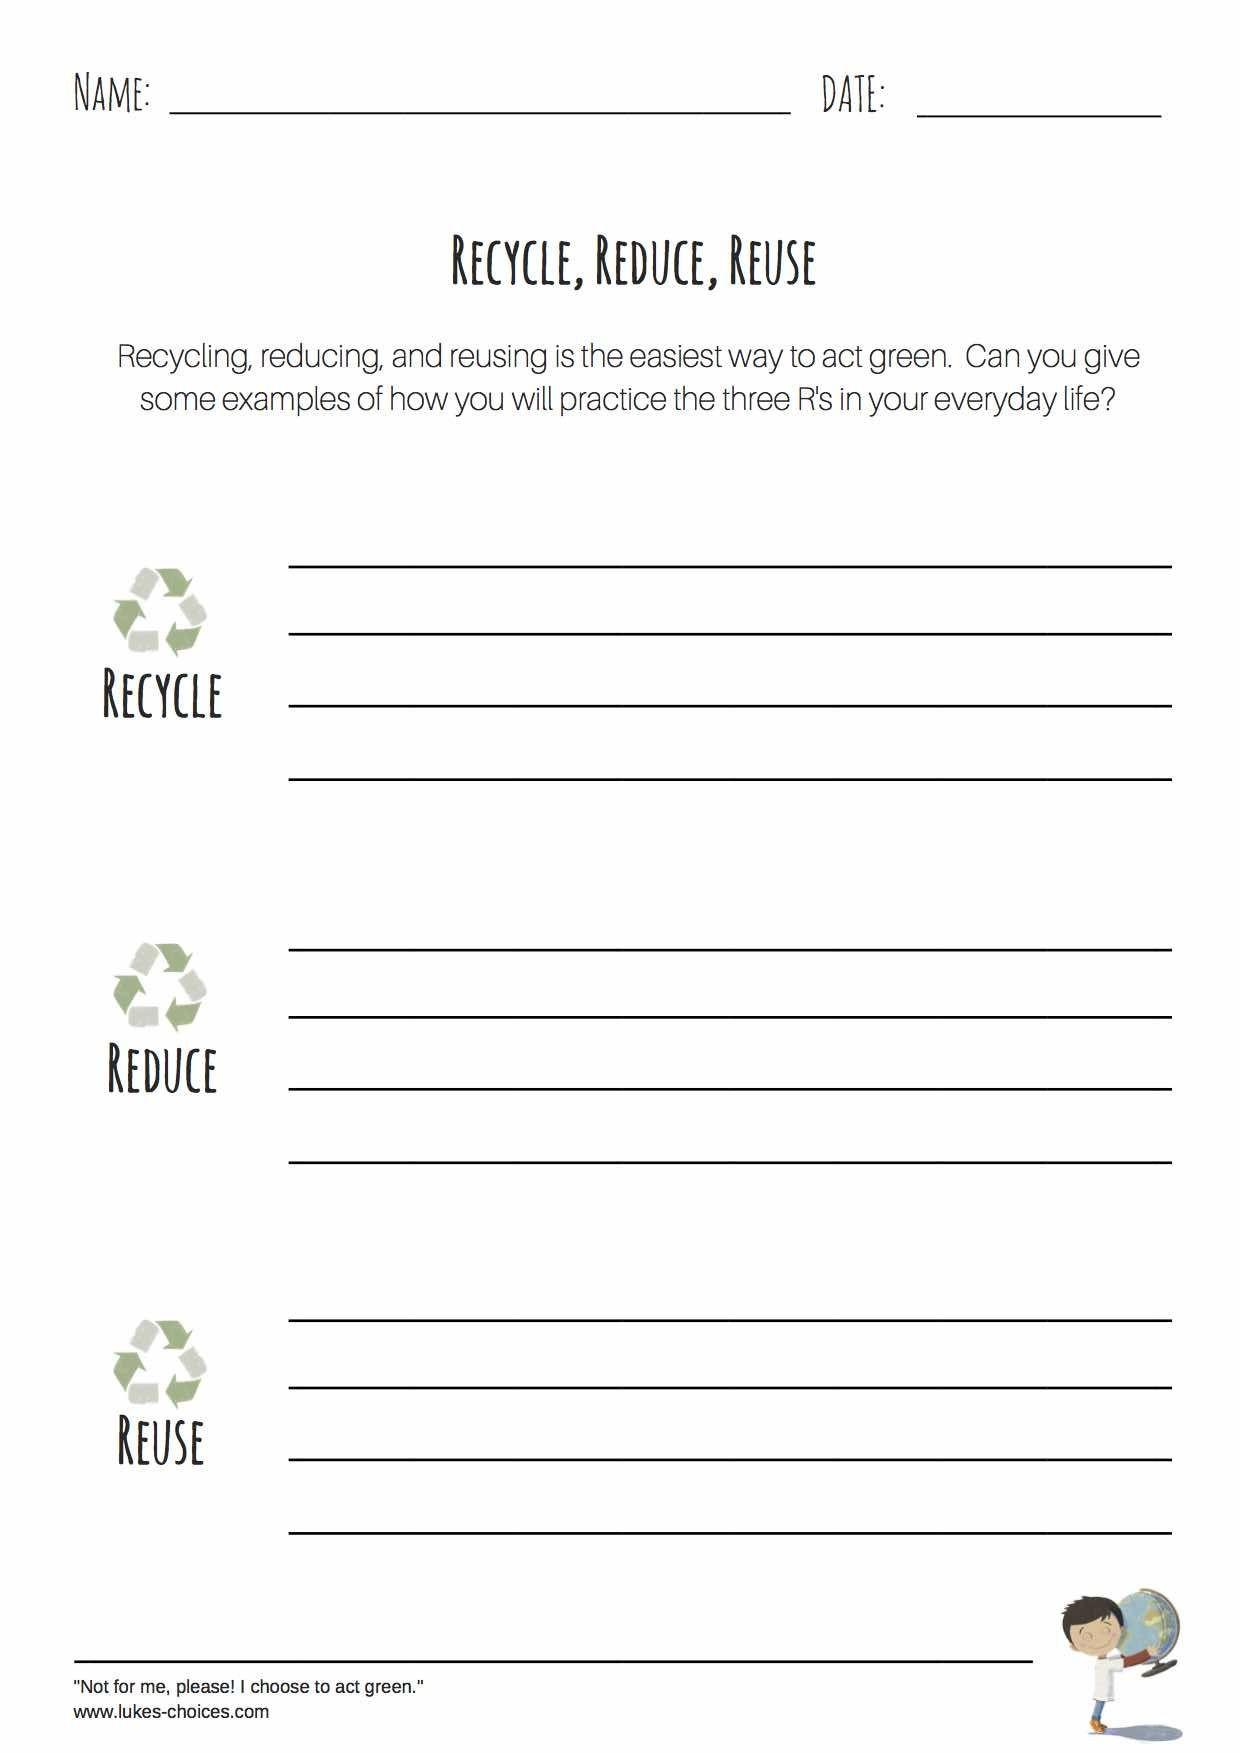 Reduce Reuse Recycle Worksheet Recycle Reduce Reuse Worksheet Plementing Our